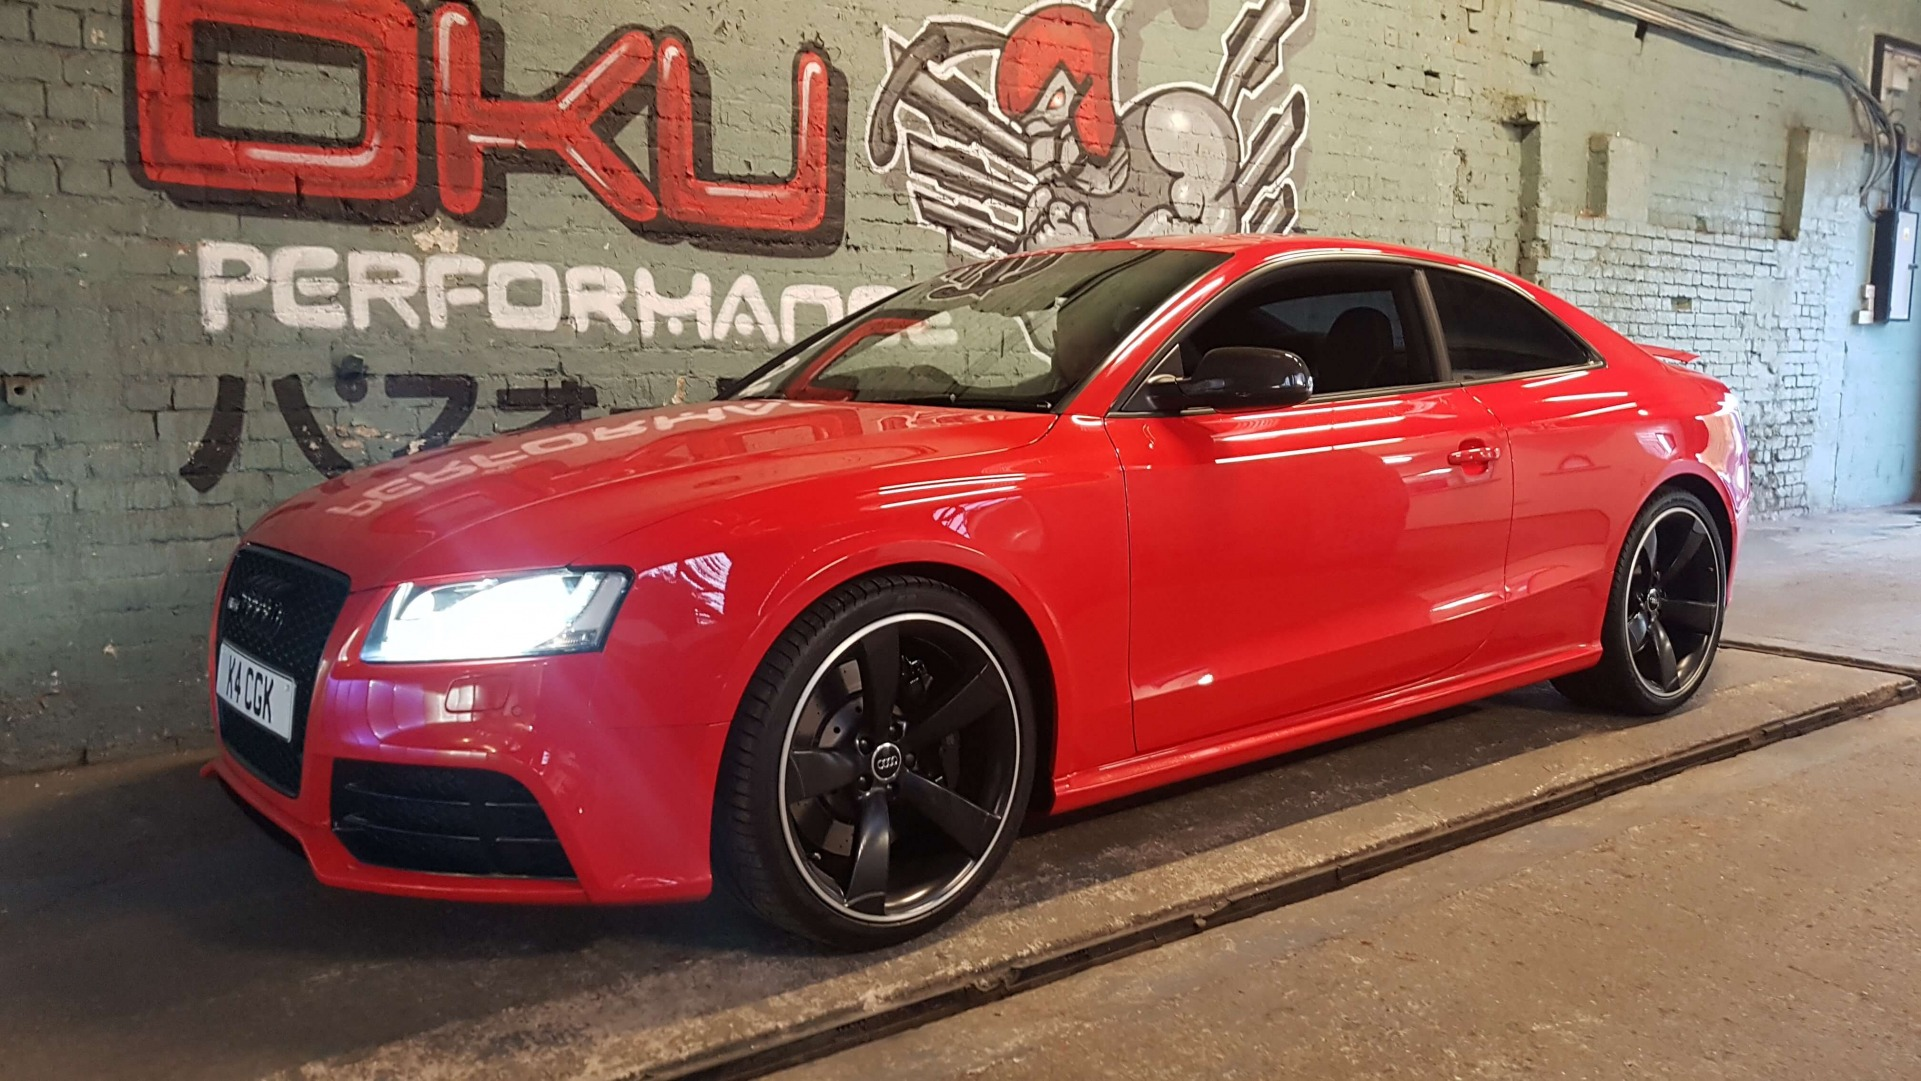 Audi RS5 4.2 V8 FSI Exhaust system